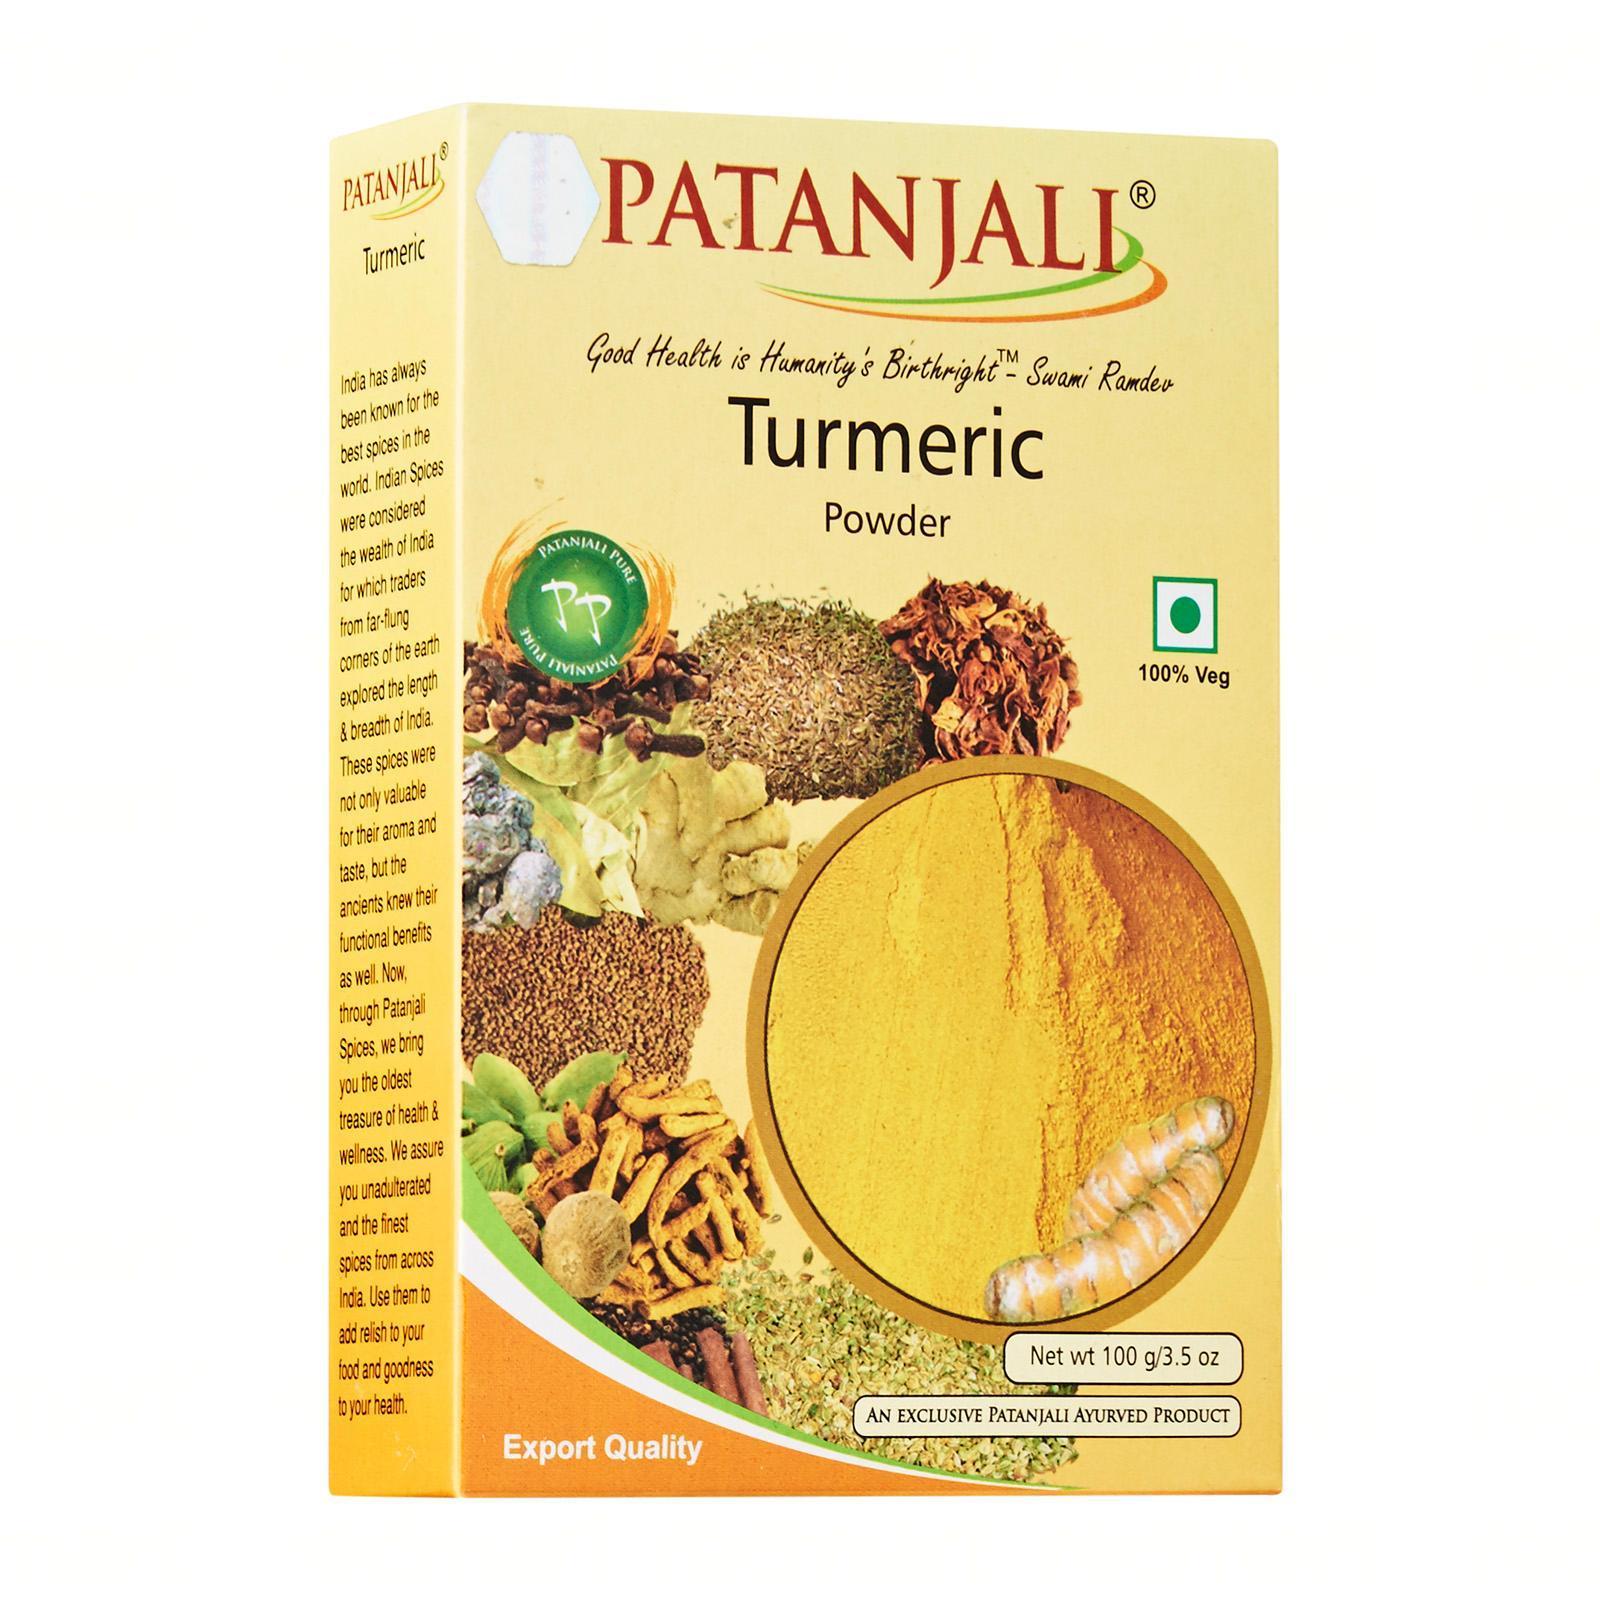 Patanjali Turmeric Powder - By Dashmesh